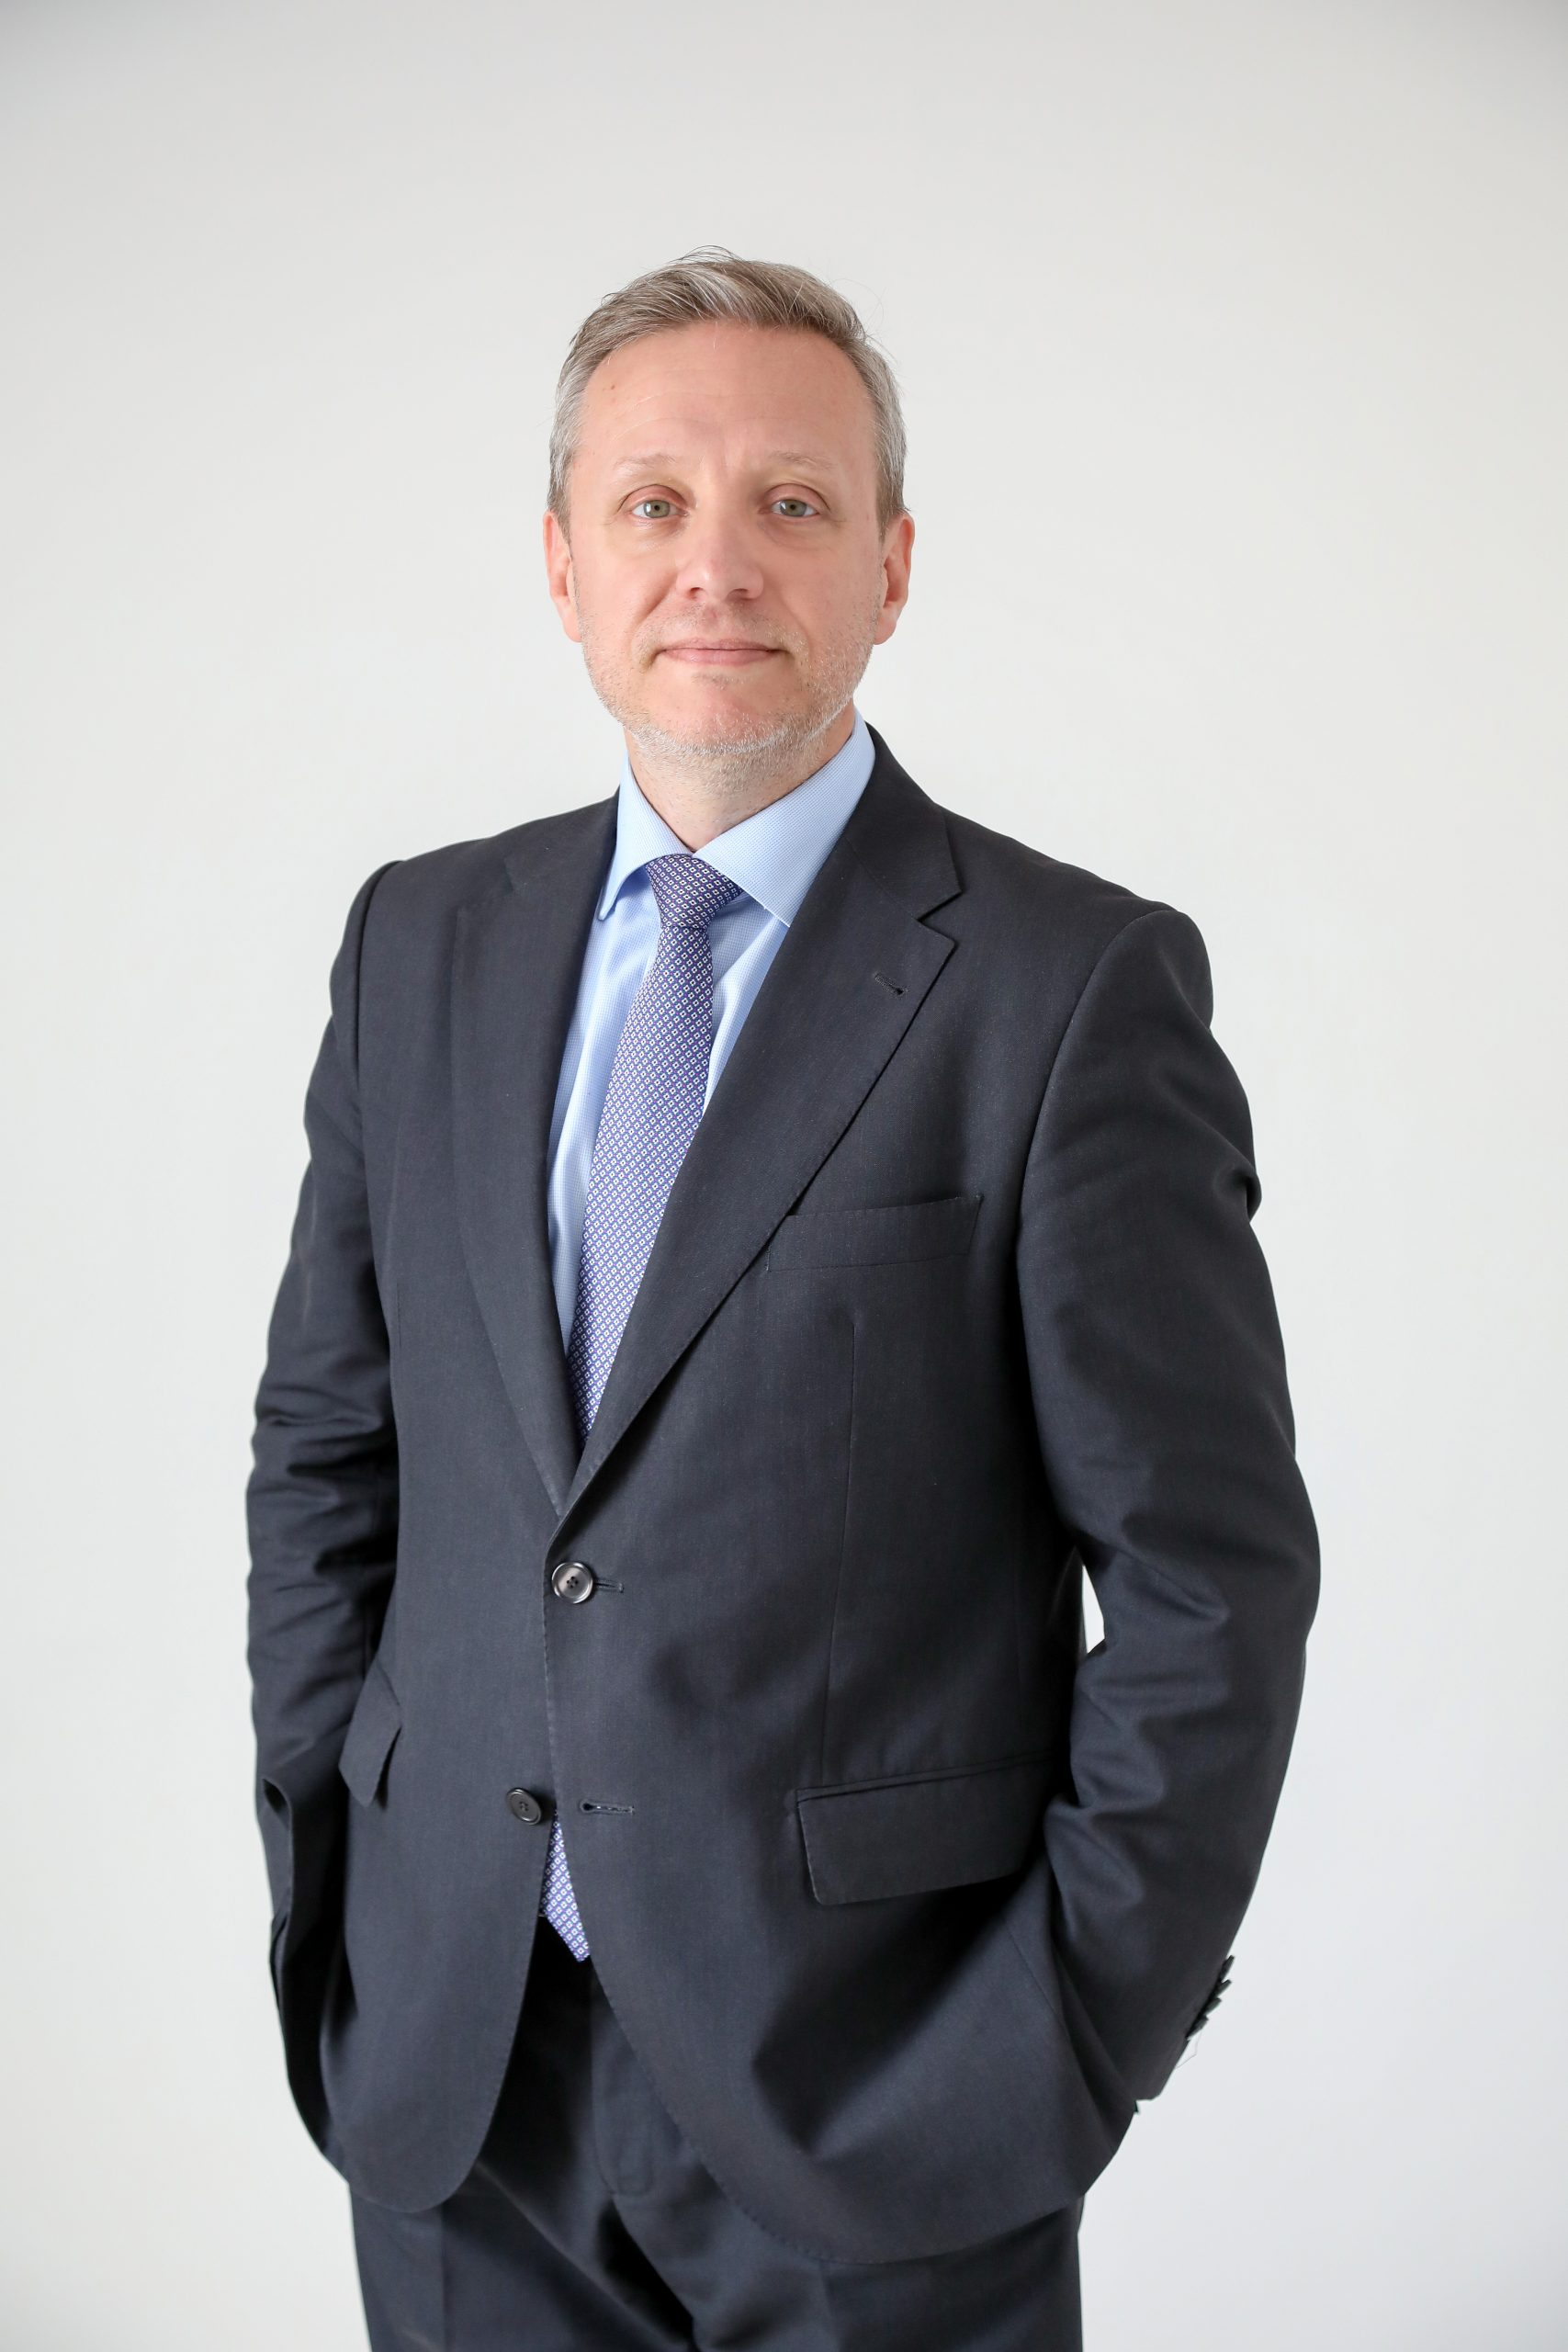 Xavier Plana